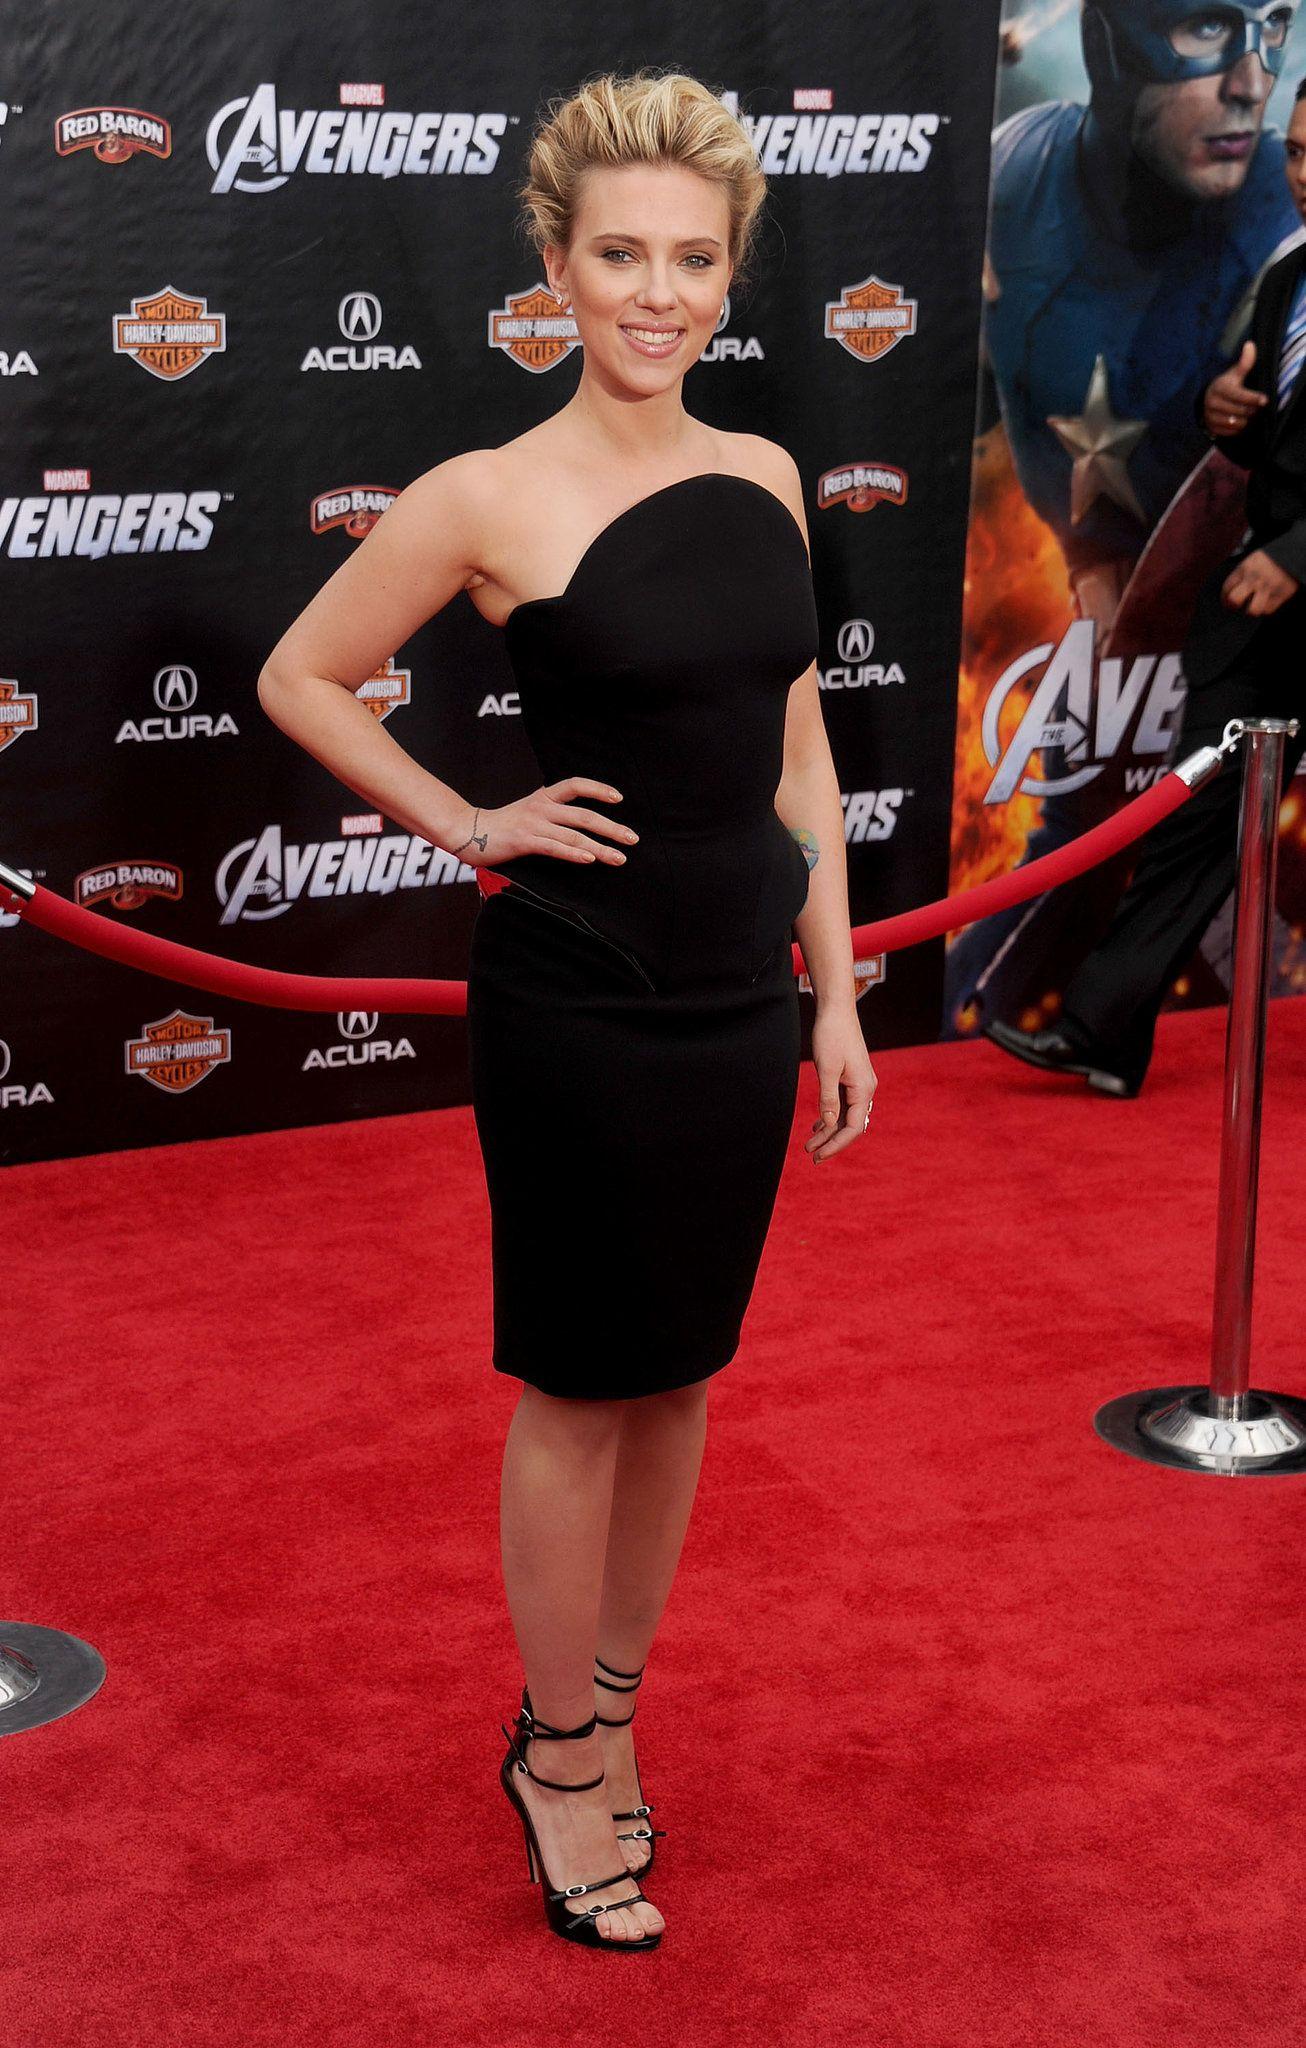 Scarlett Johansson at The Avengers LA premiere, 2012 | Pinterest